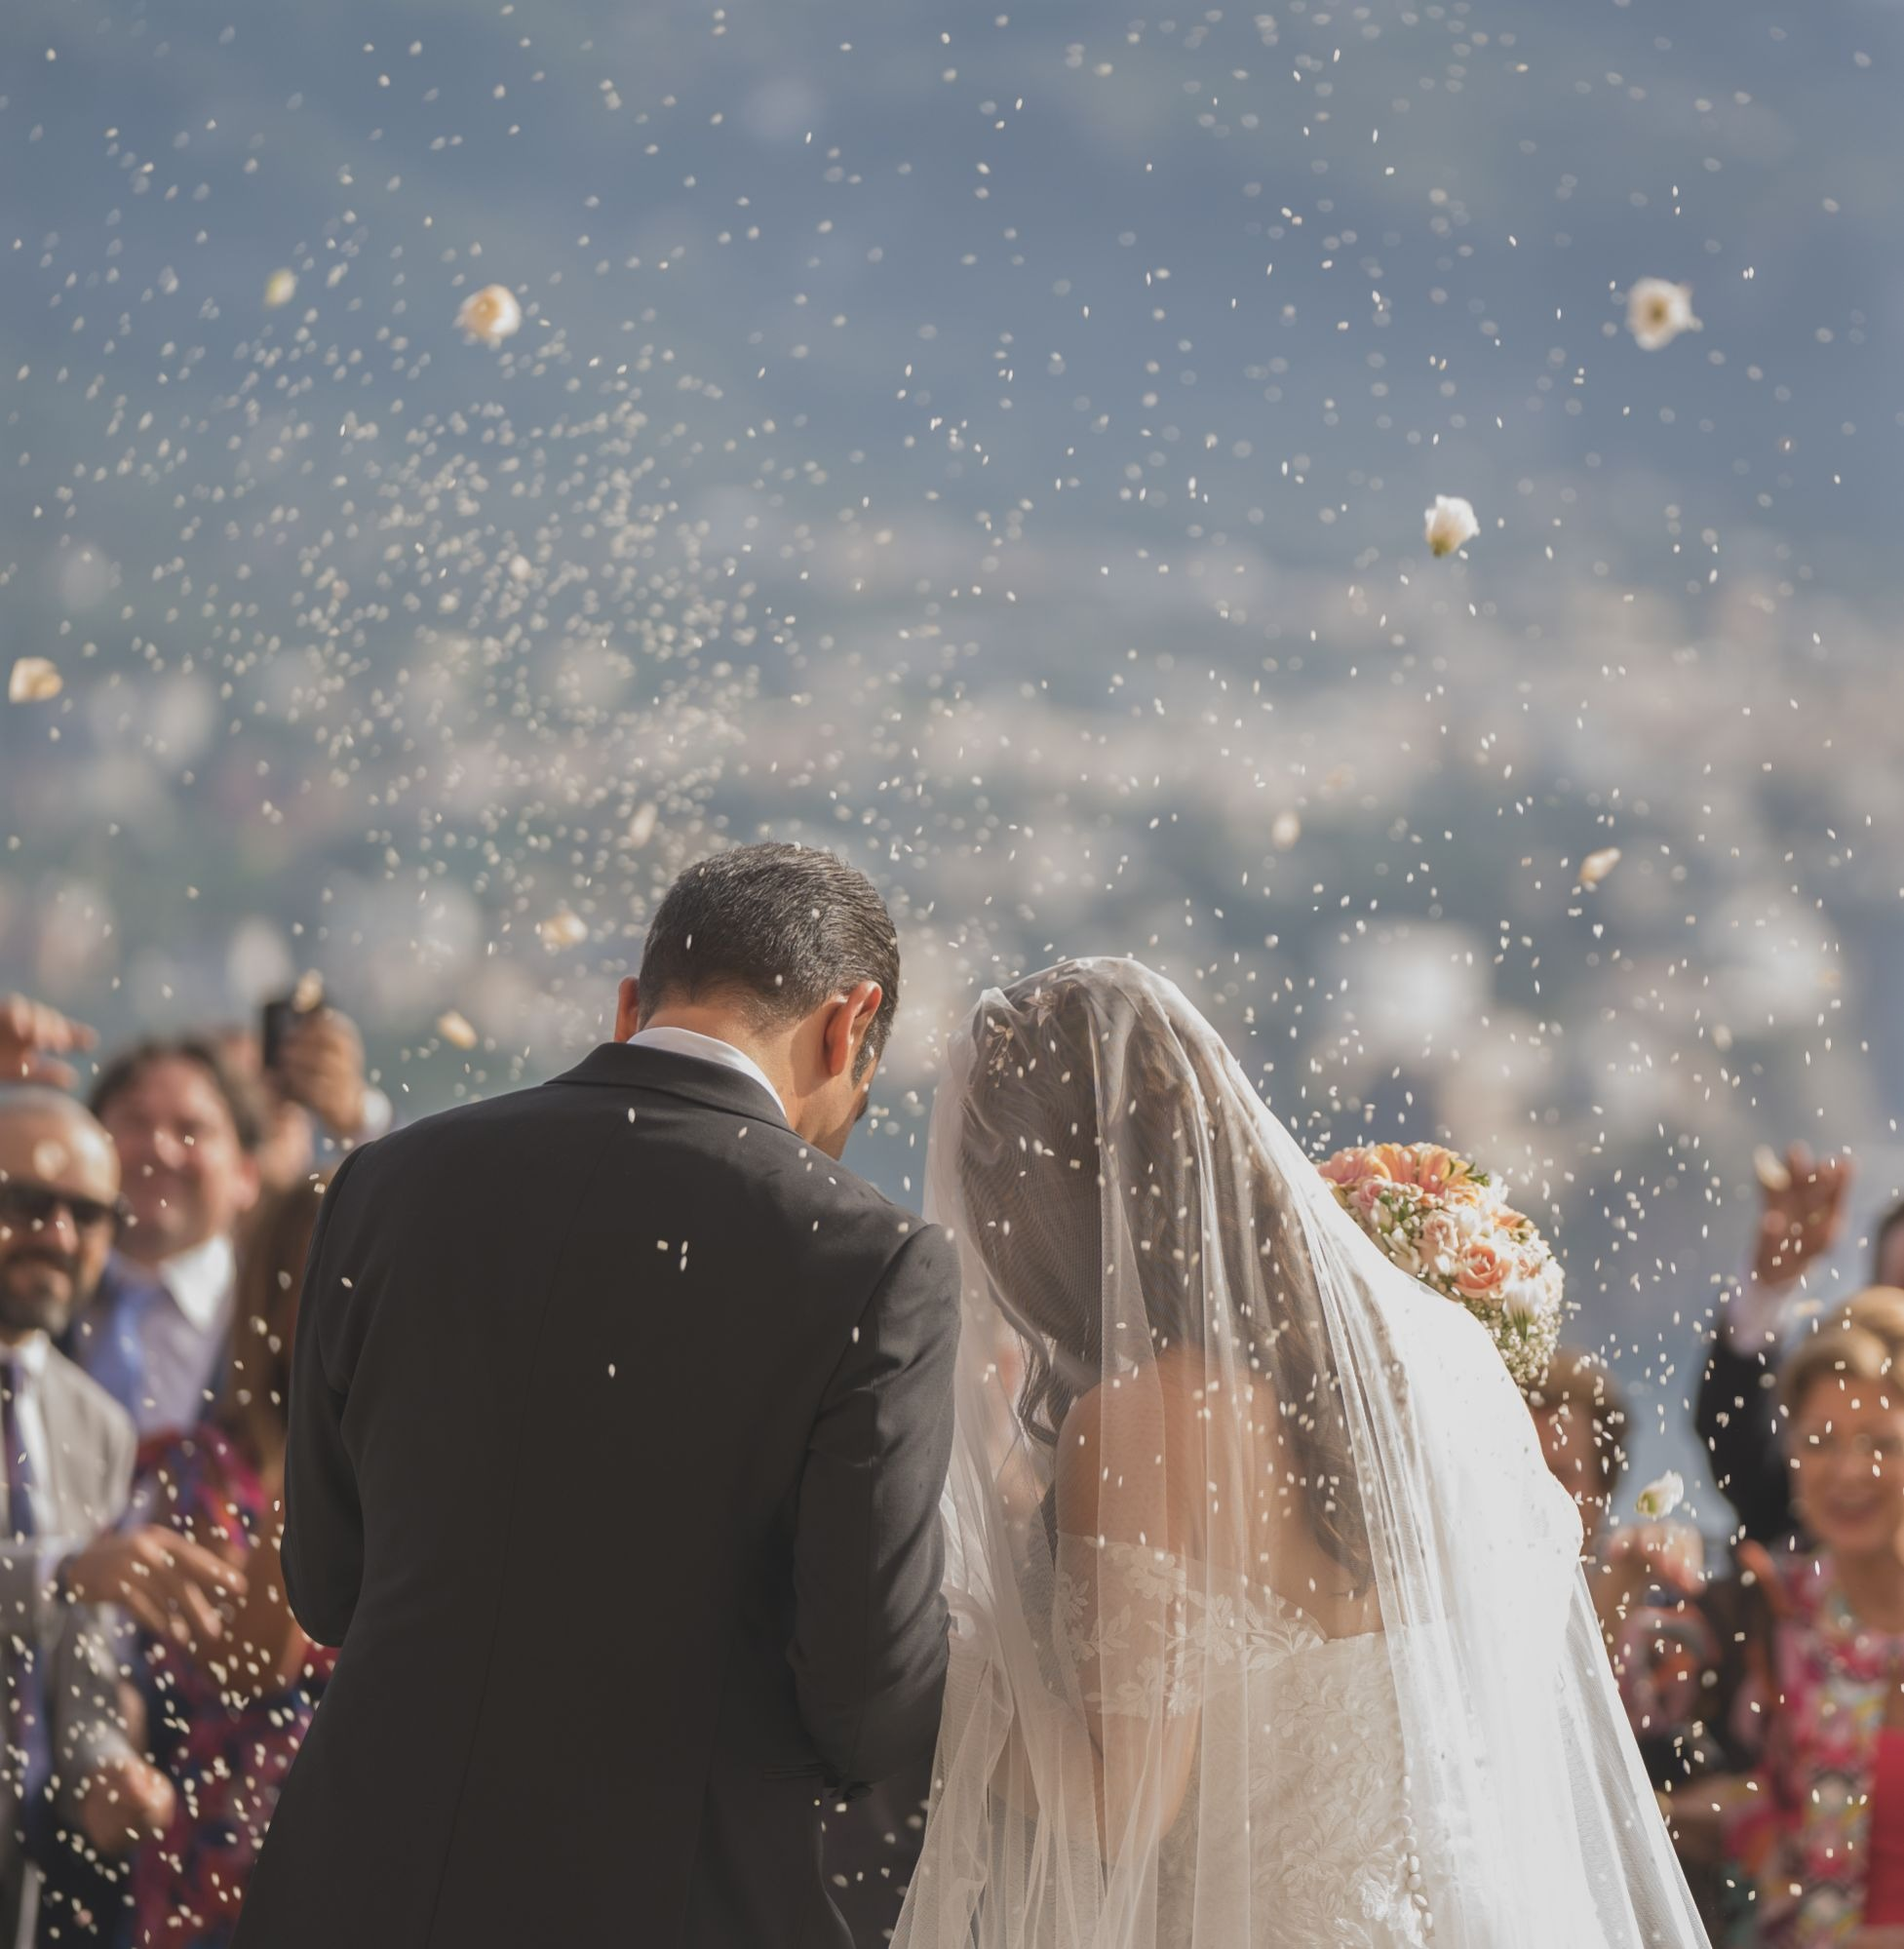 WEDDING IN VILLA TIBERIADE, NAPLES, ITALY